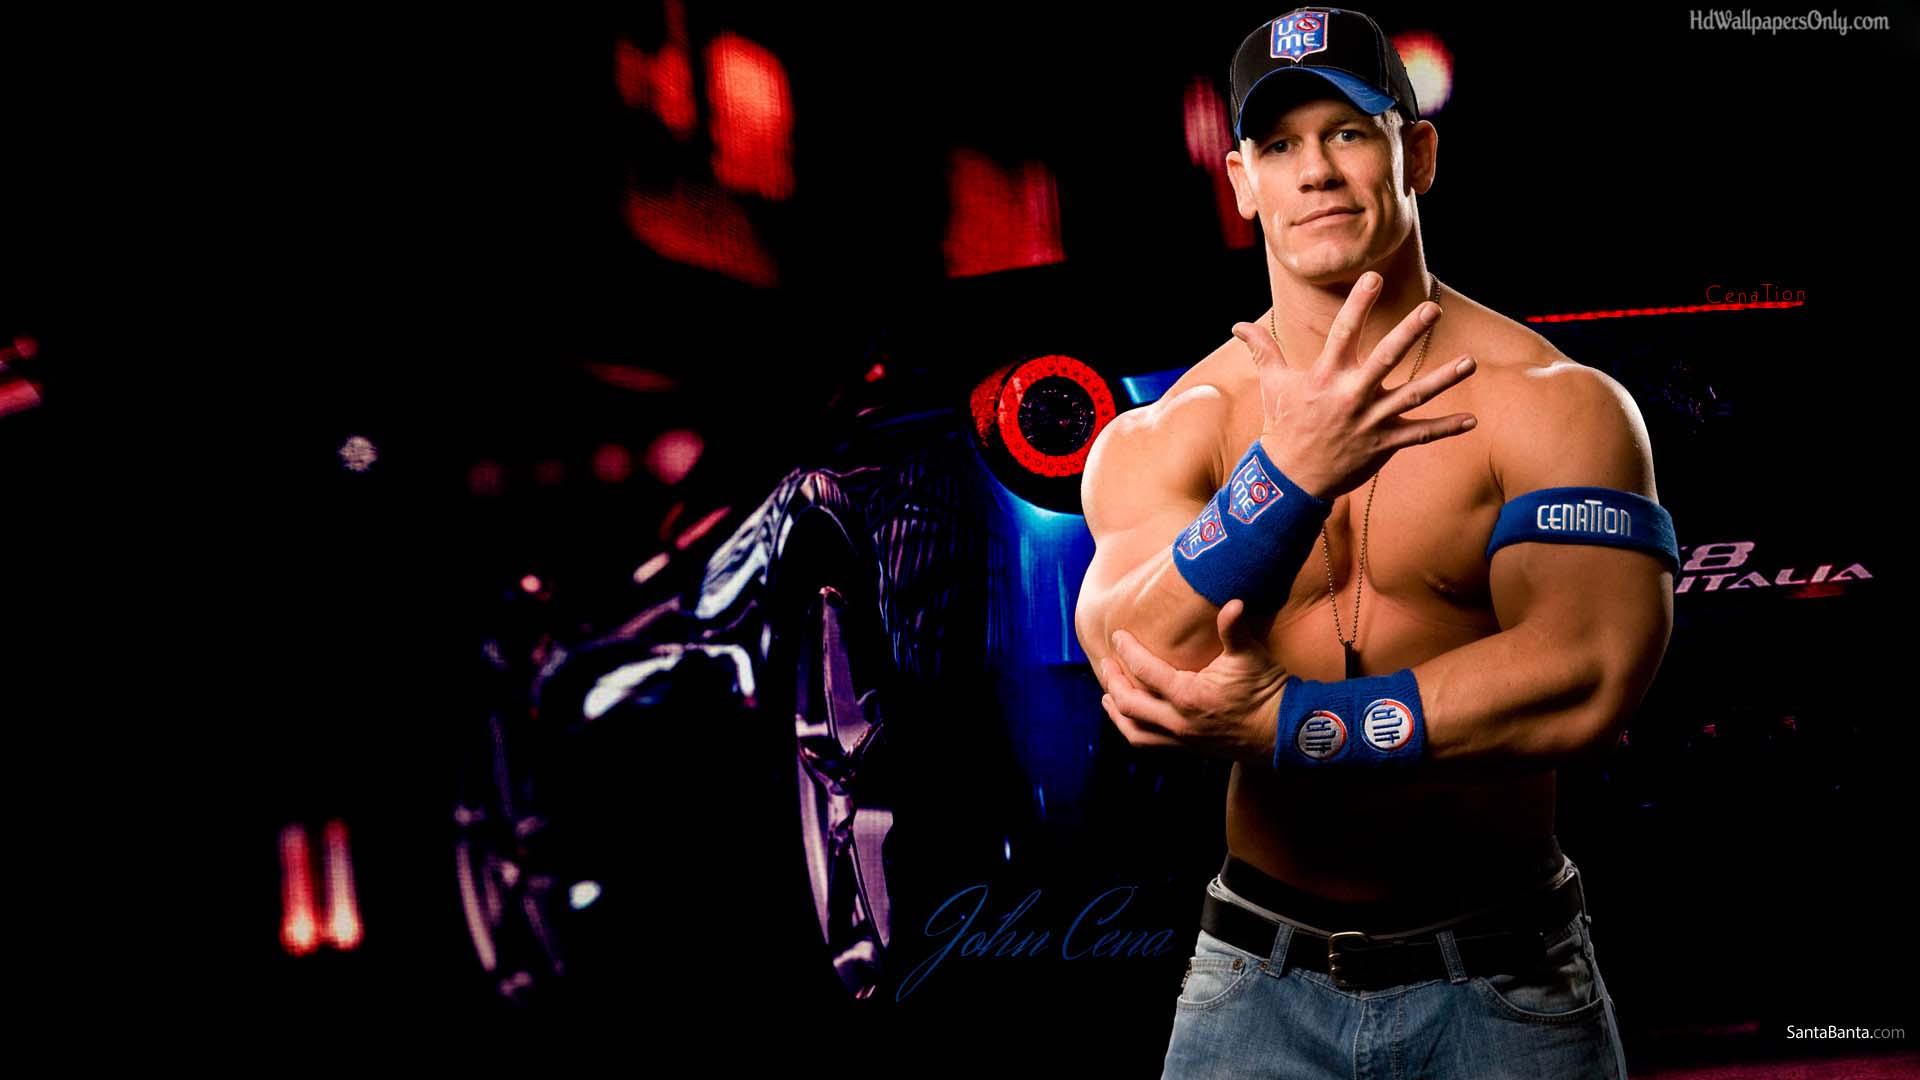 Free Download By Napoleon Aylor John Cena Hd Wallpapers